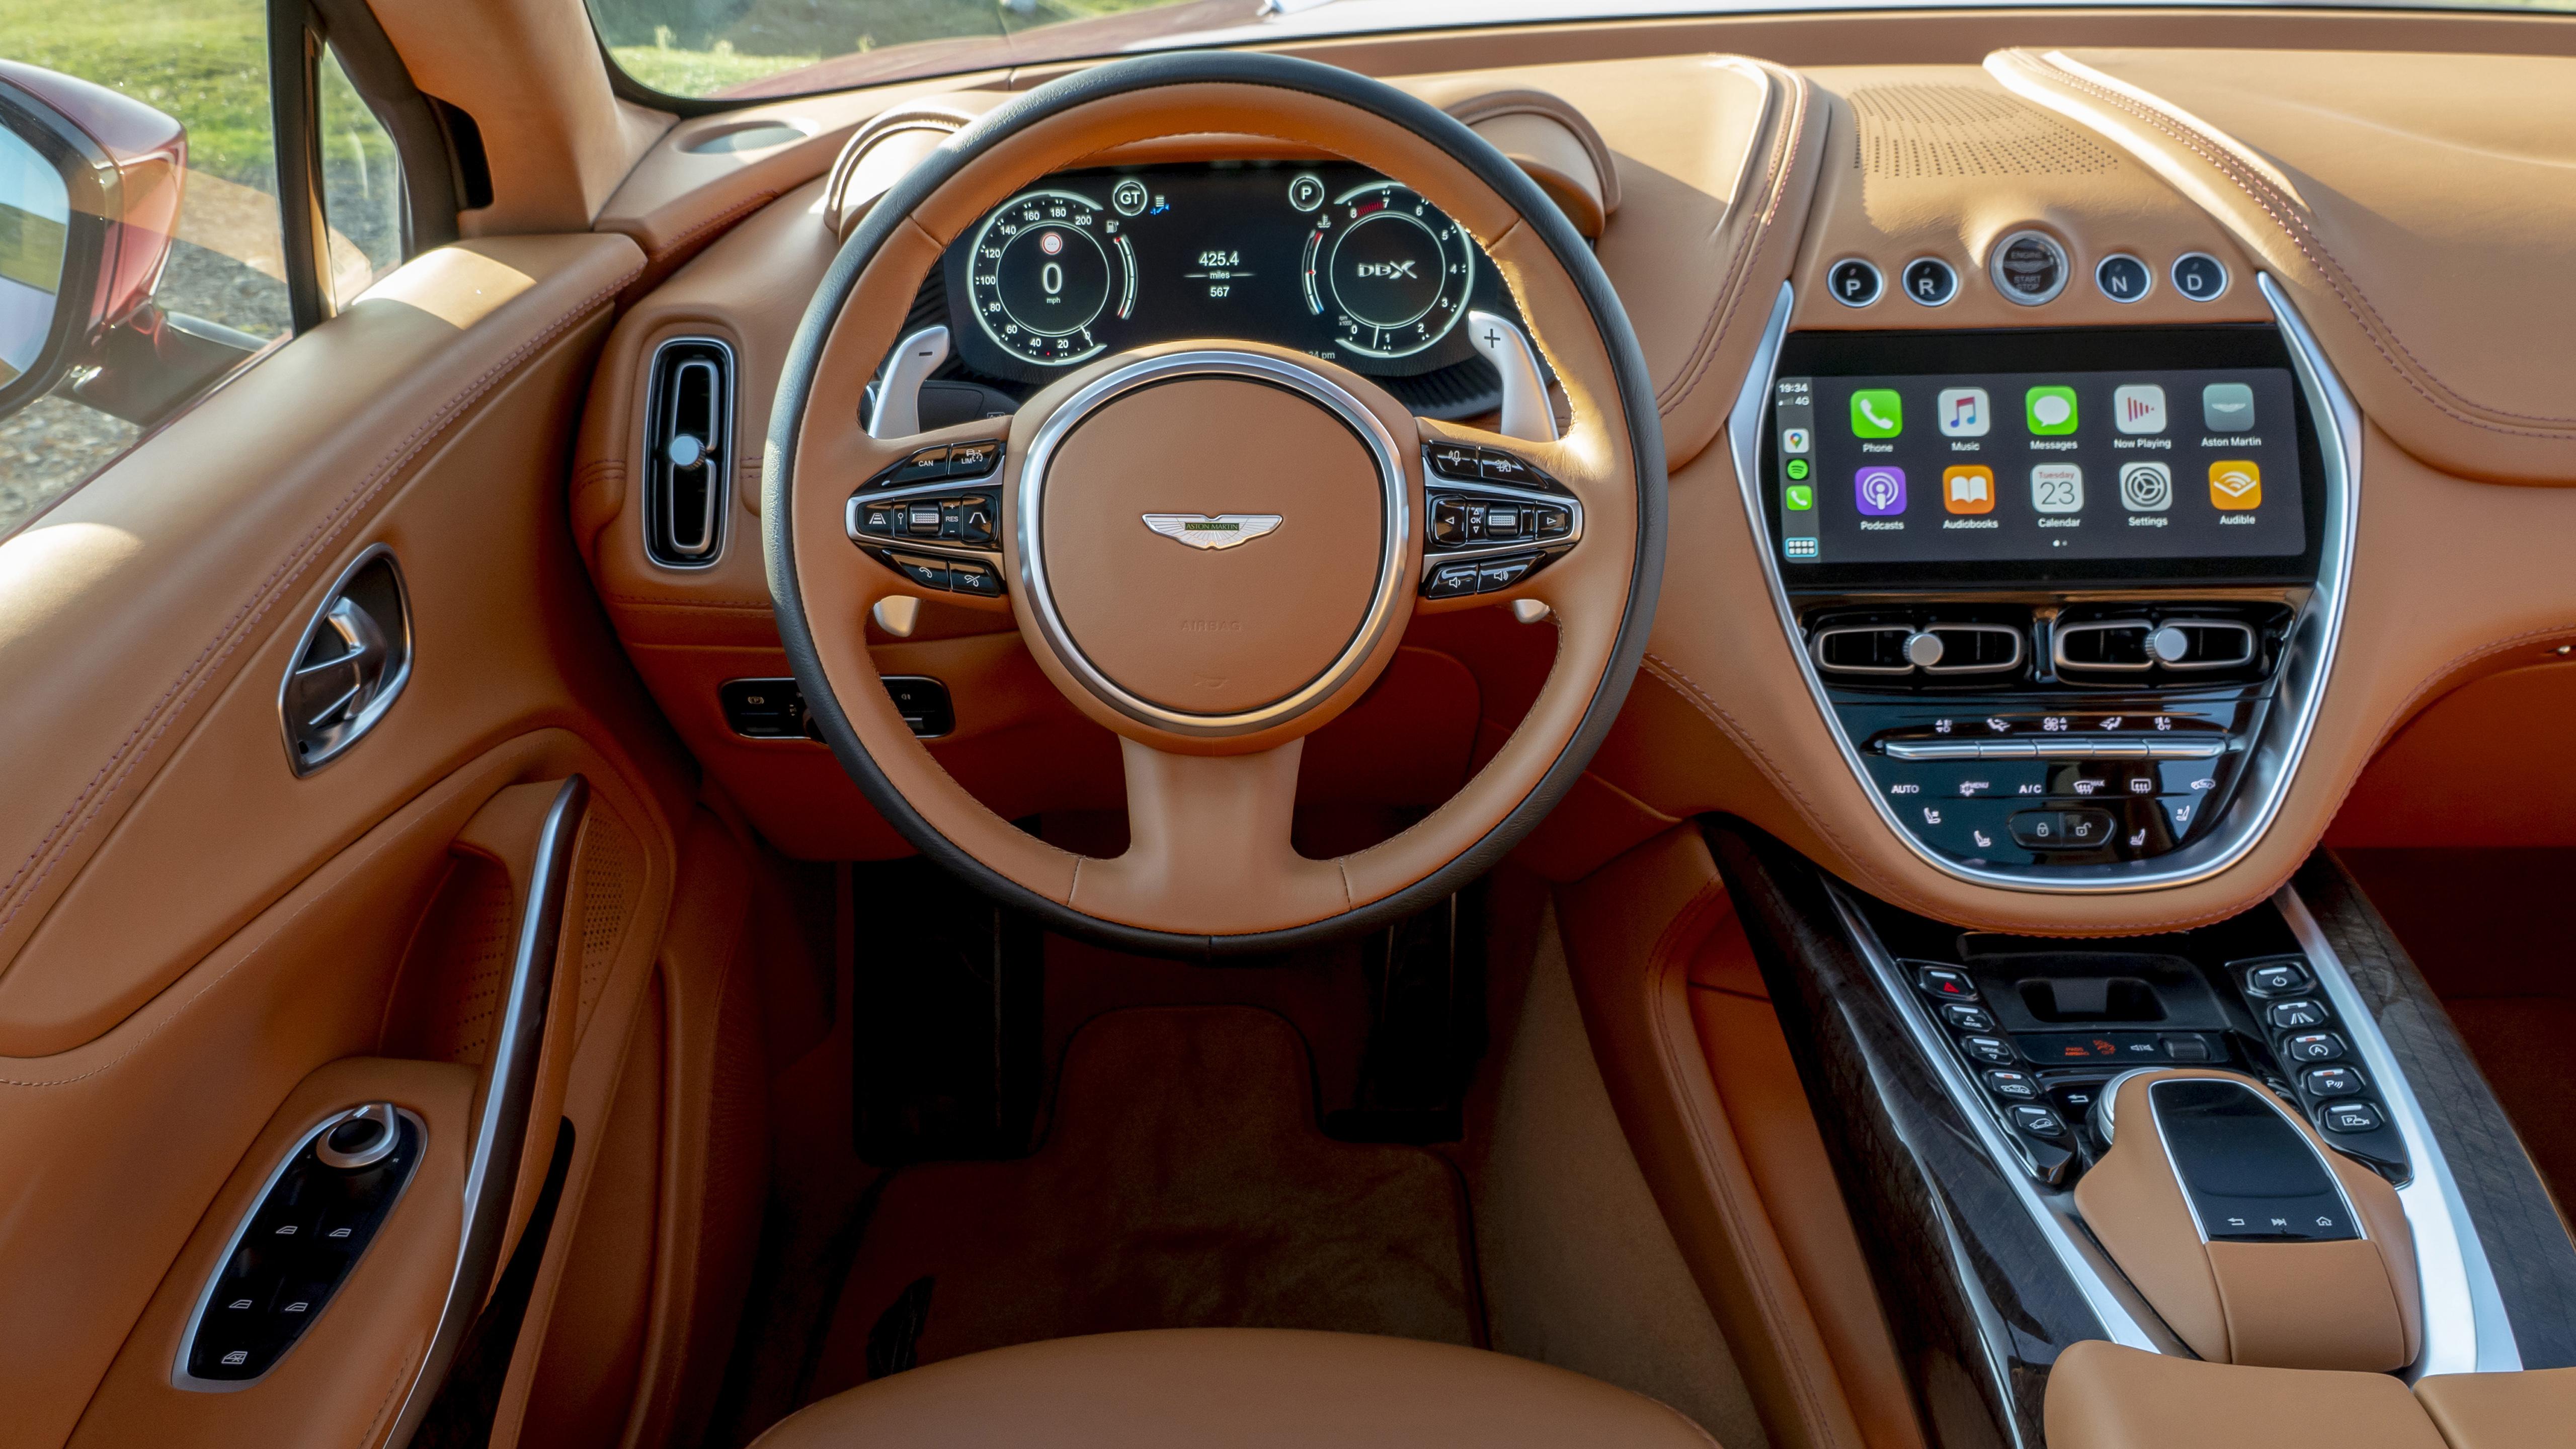 2020 Aston Martin Dbx 5k Interior Wallpaper Hd Car Wallpapers Id 15807